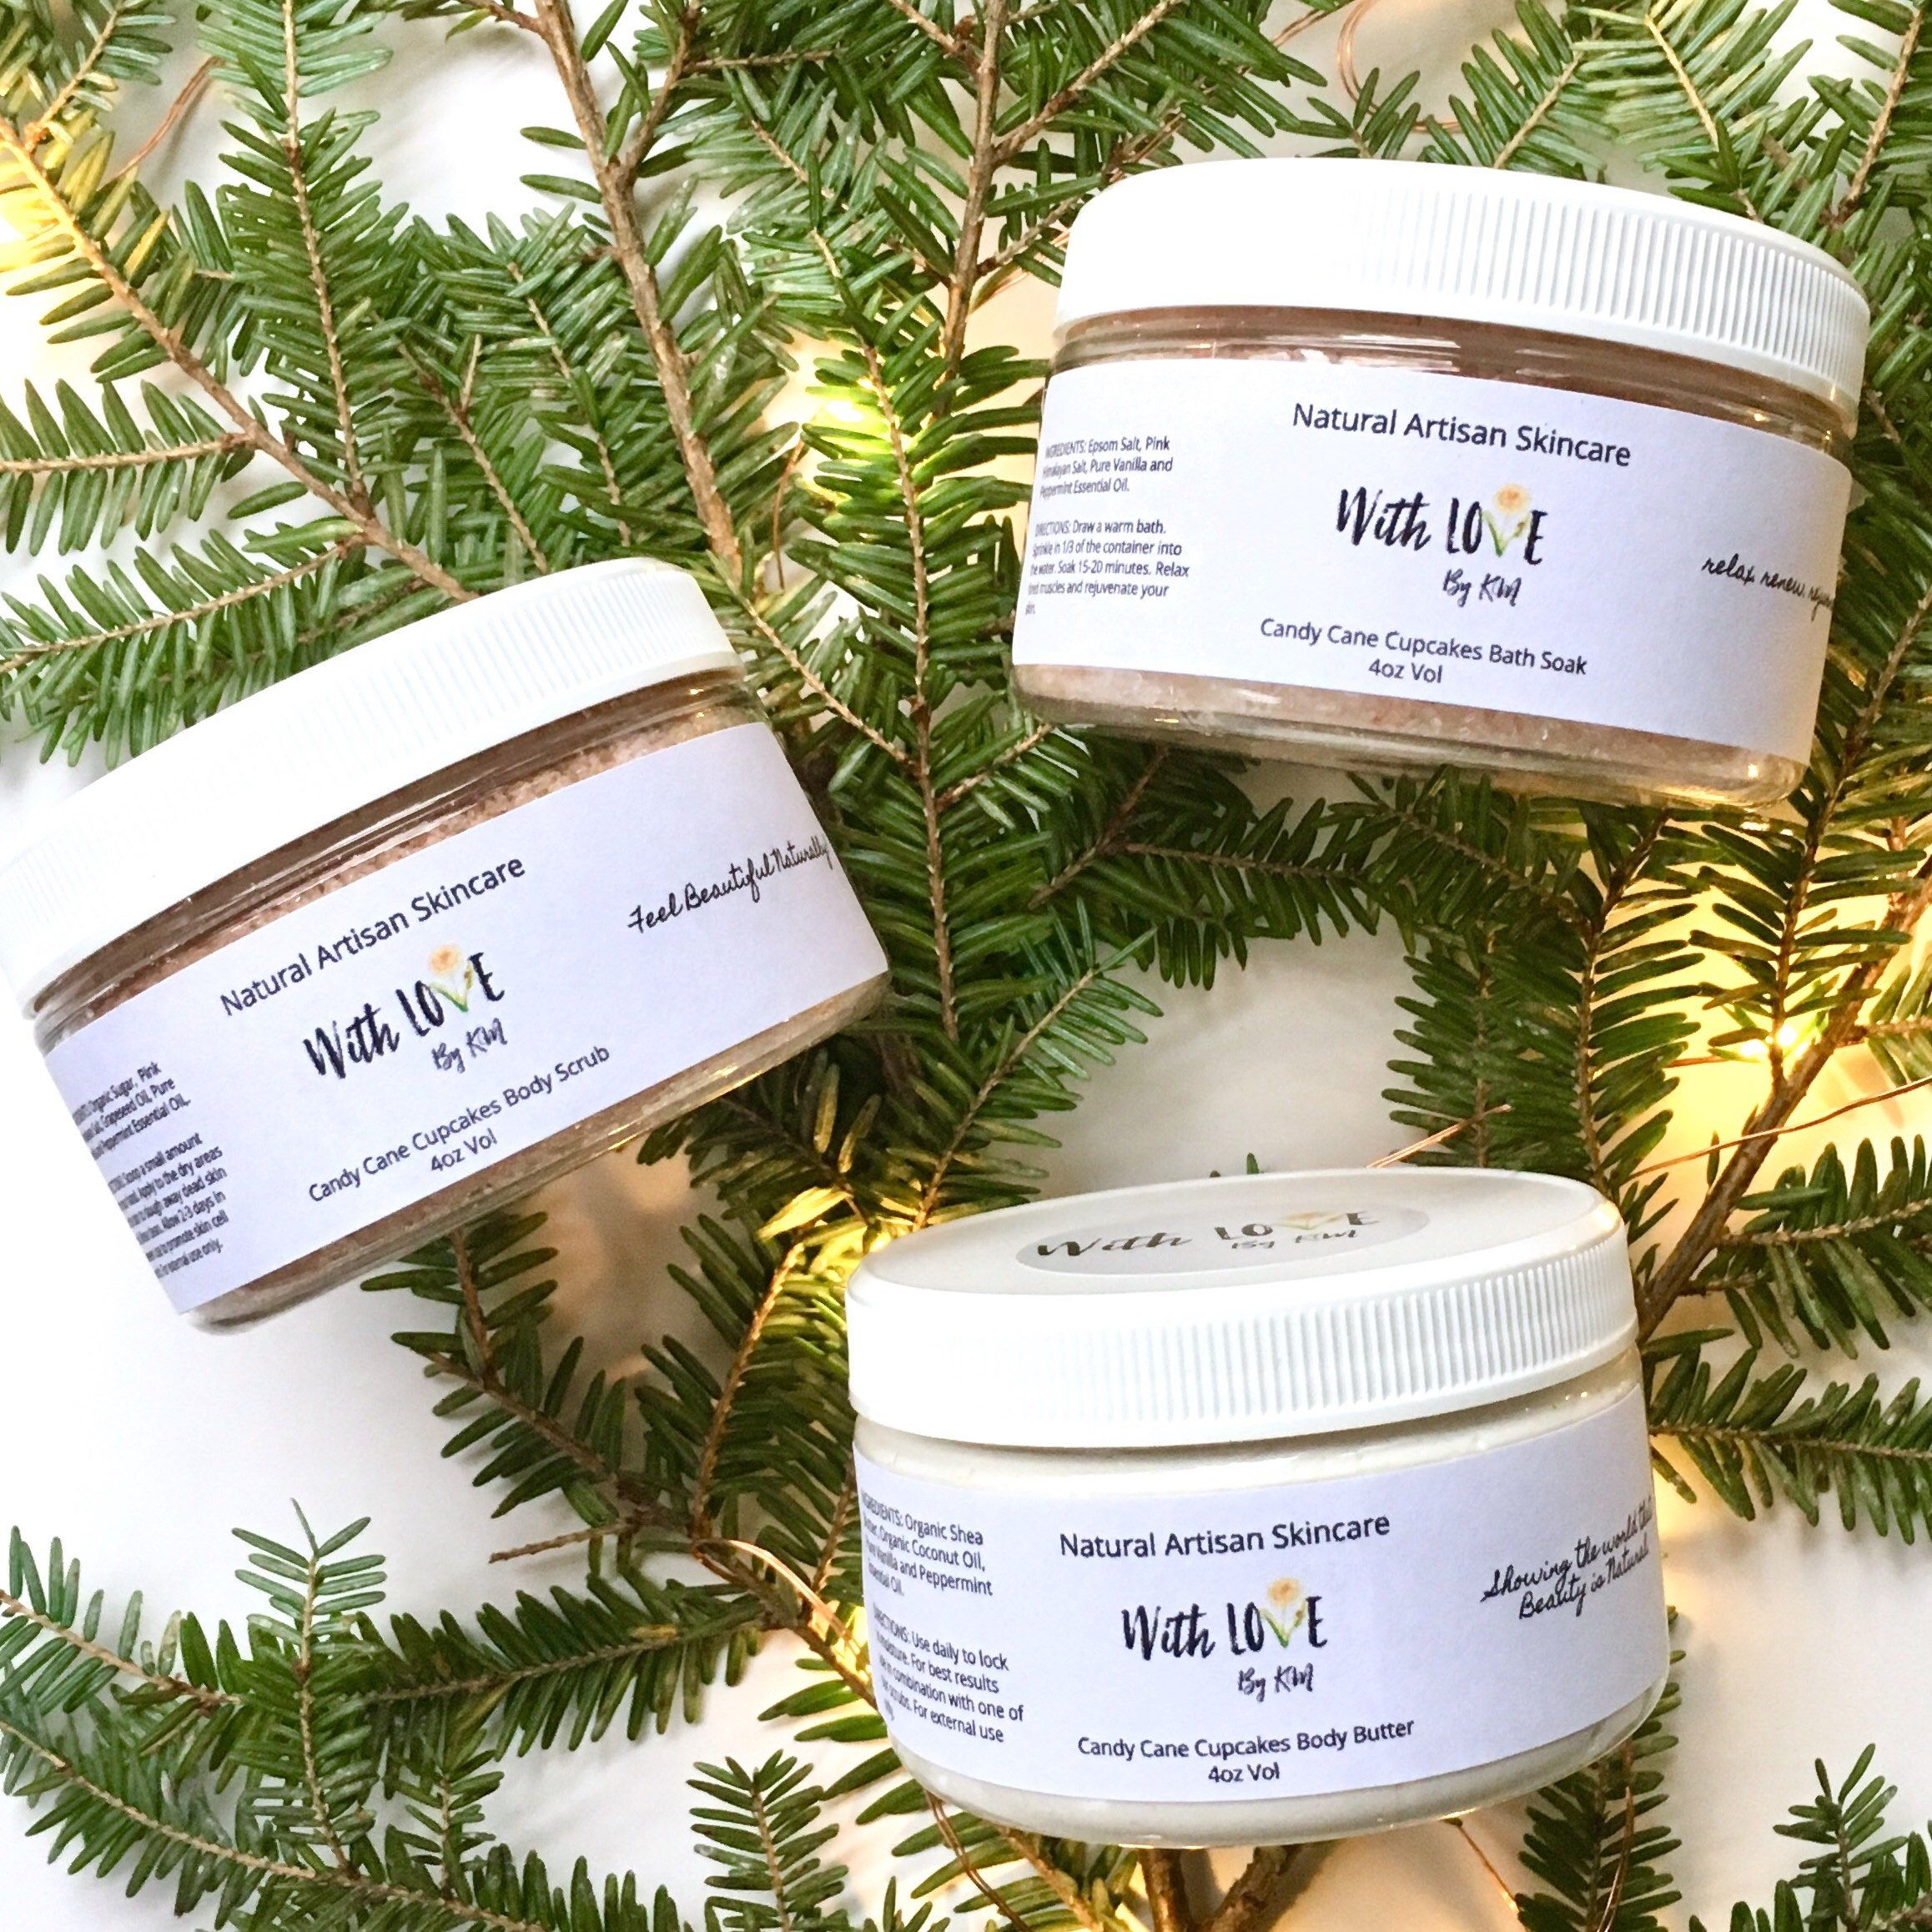 candy cane cupcakes spa gift vegan christmas gift vanilla peppermint spa set organic - Vegan Christmas Gifts